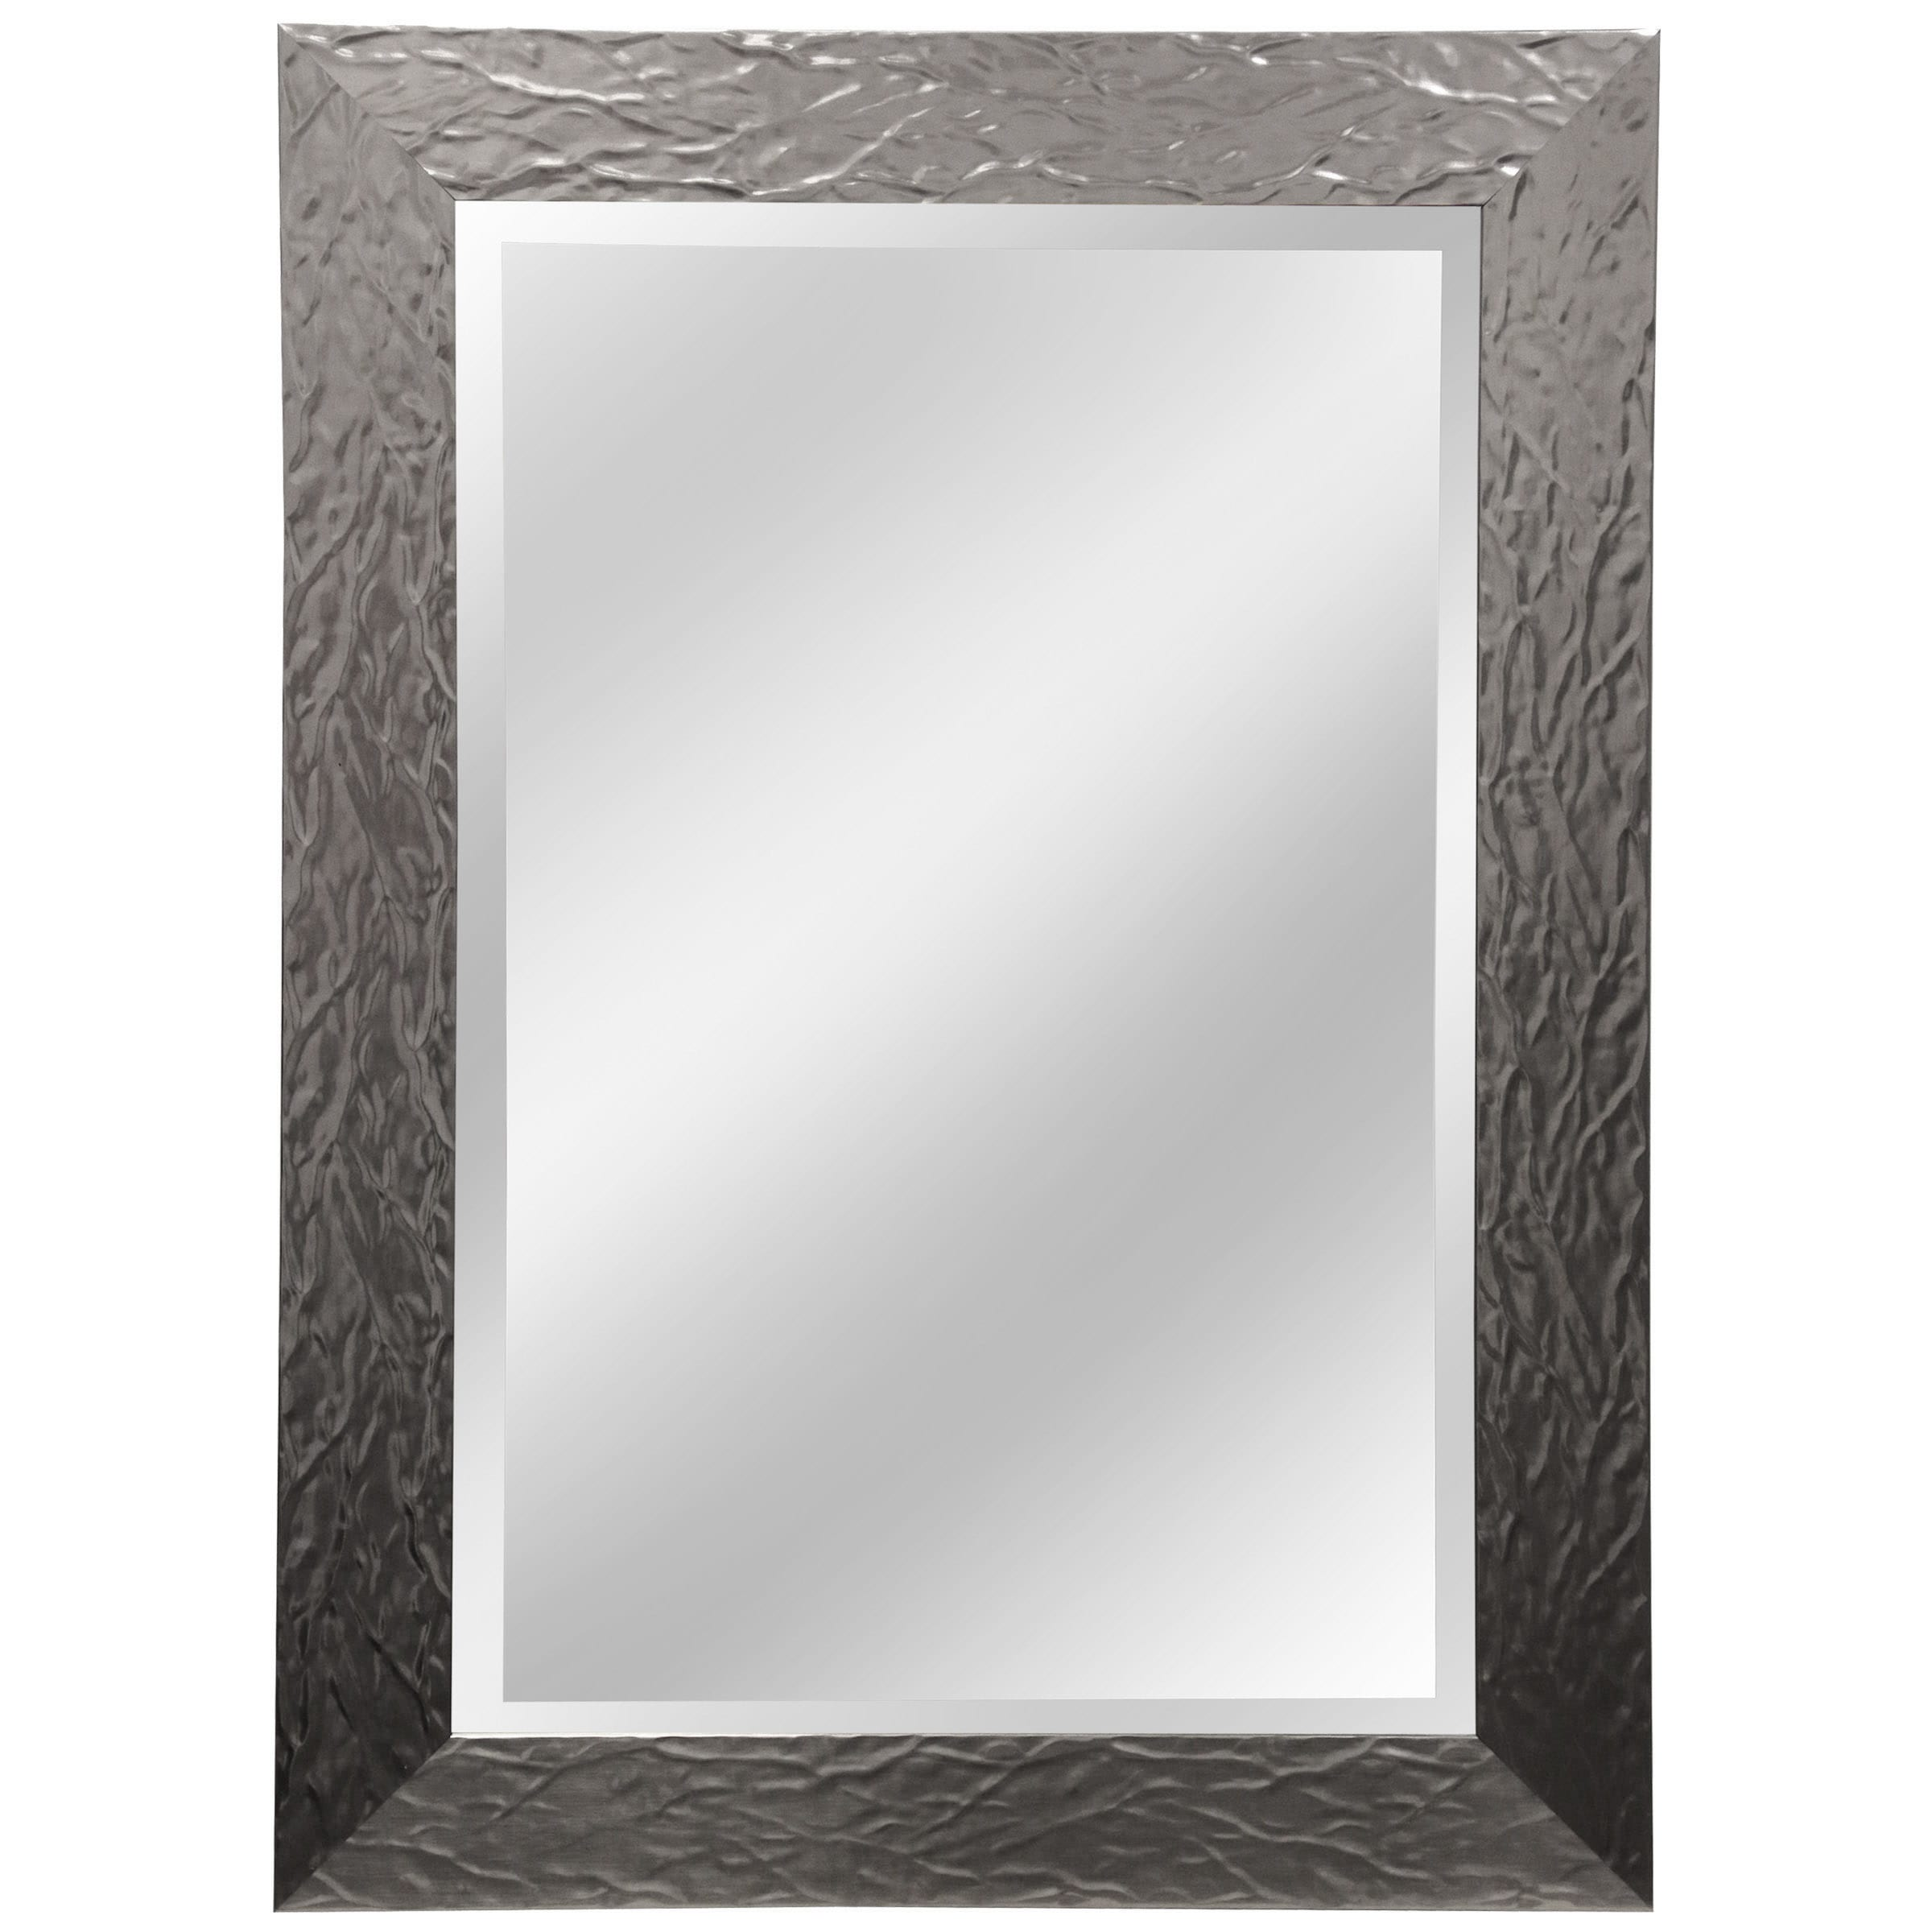 "43"" Beveled Mirror - Aged Nickel"